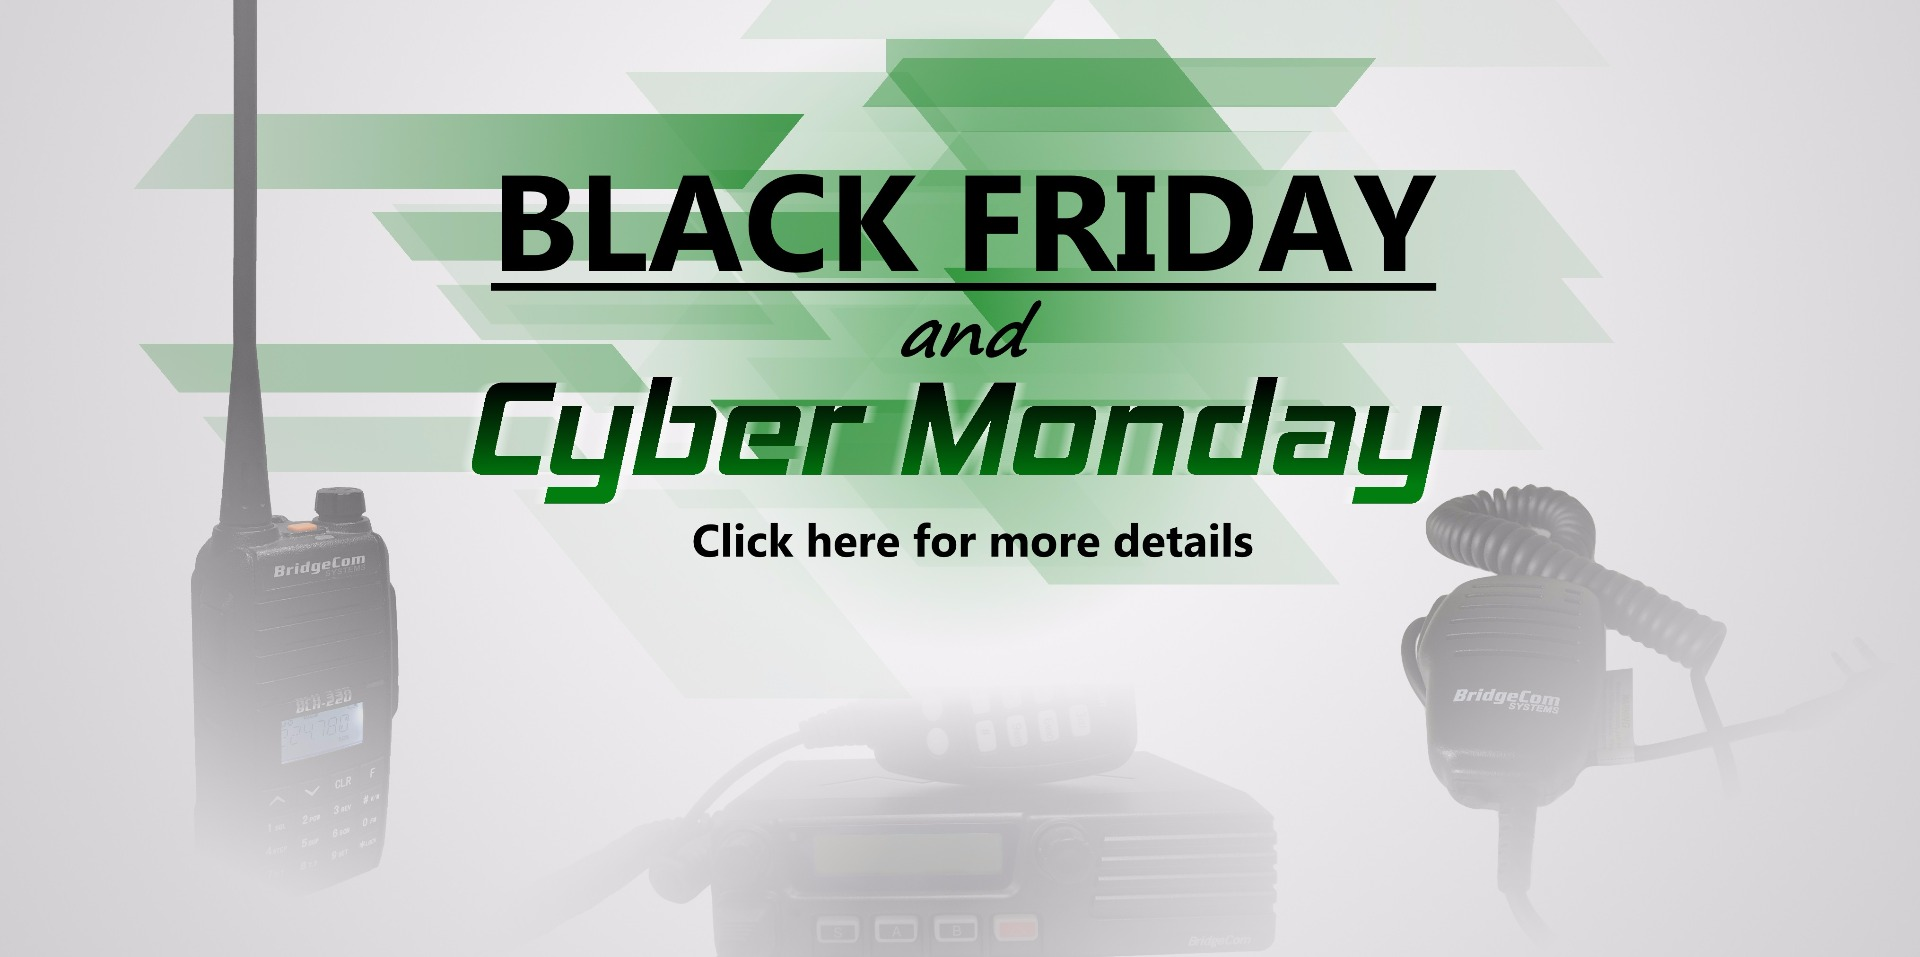 Black Friday Cyber Monday Sales #BFCM